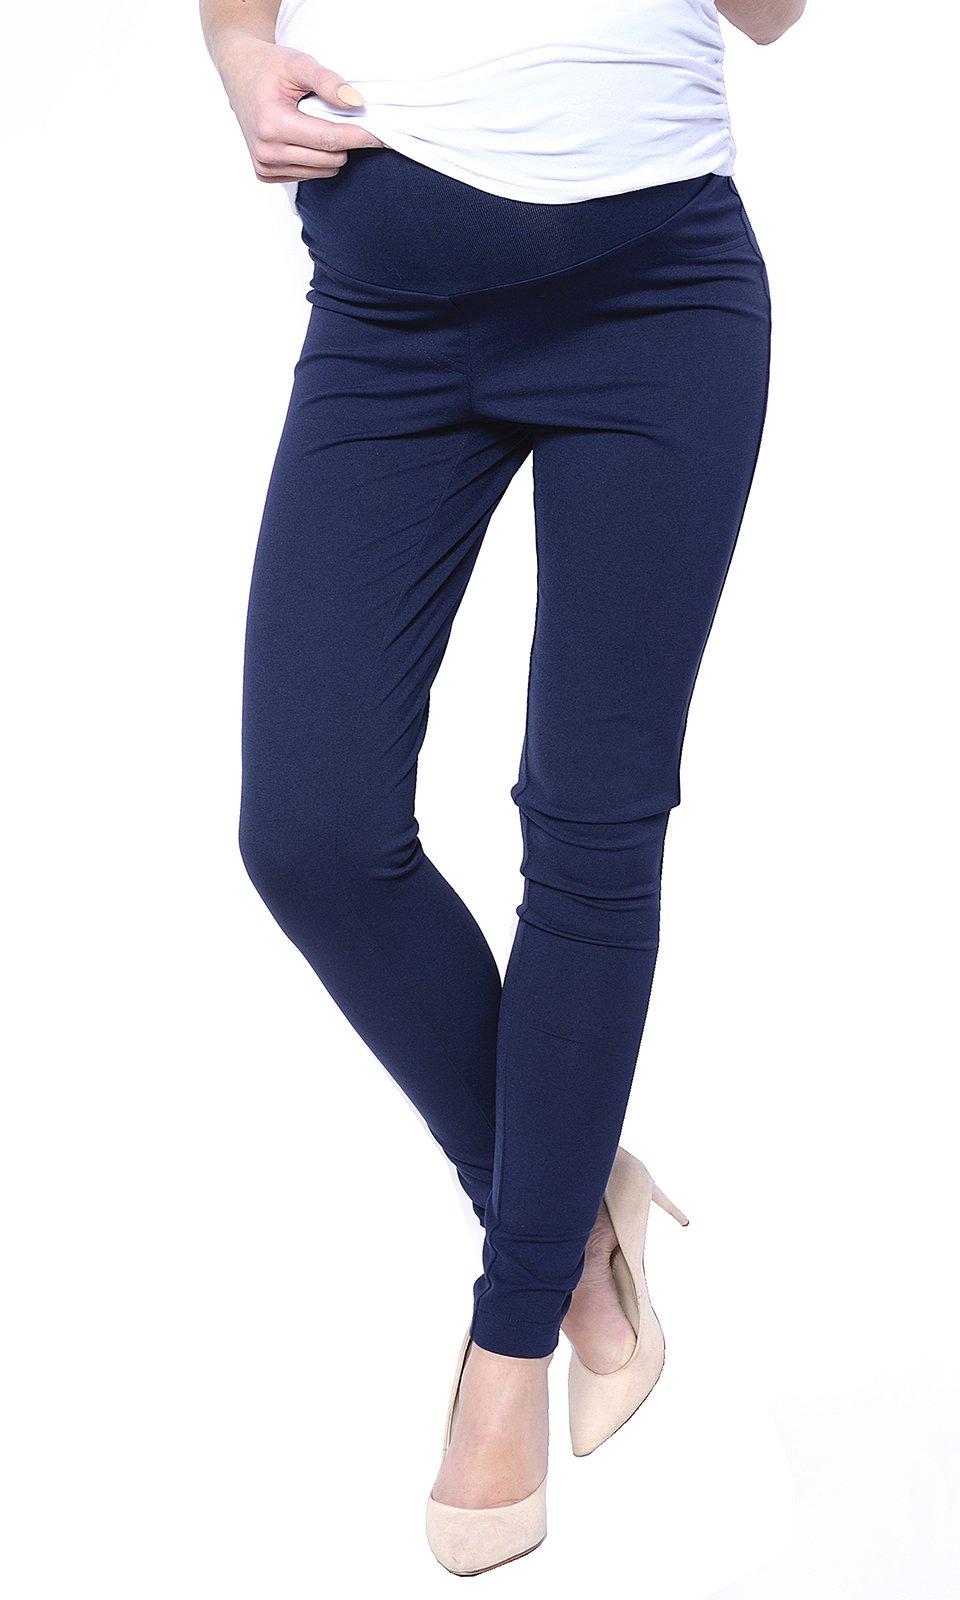 Mija - Elegant Women Maternity Slim Pants Trousers 1046 (US 8, Navy Blue)